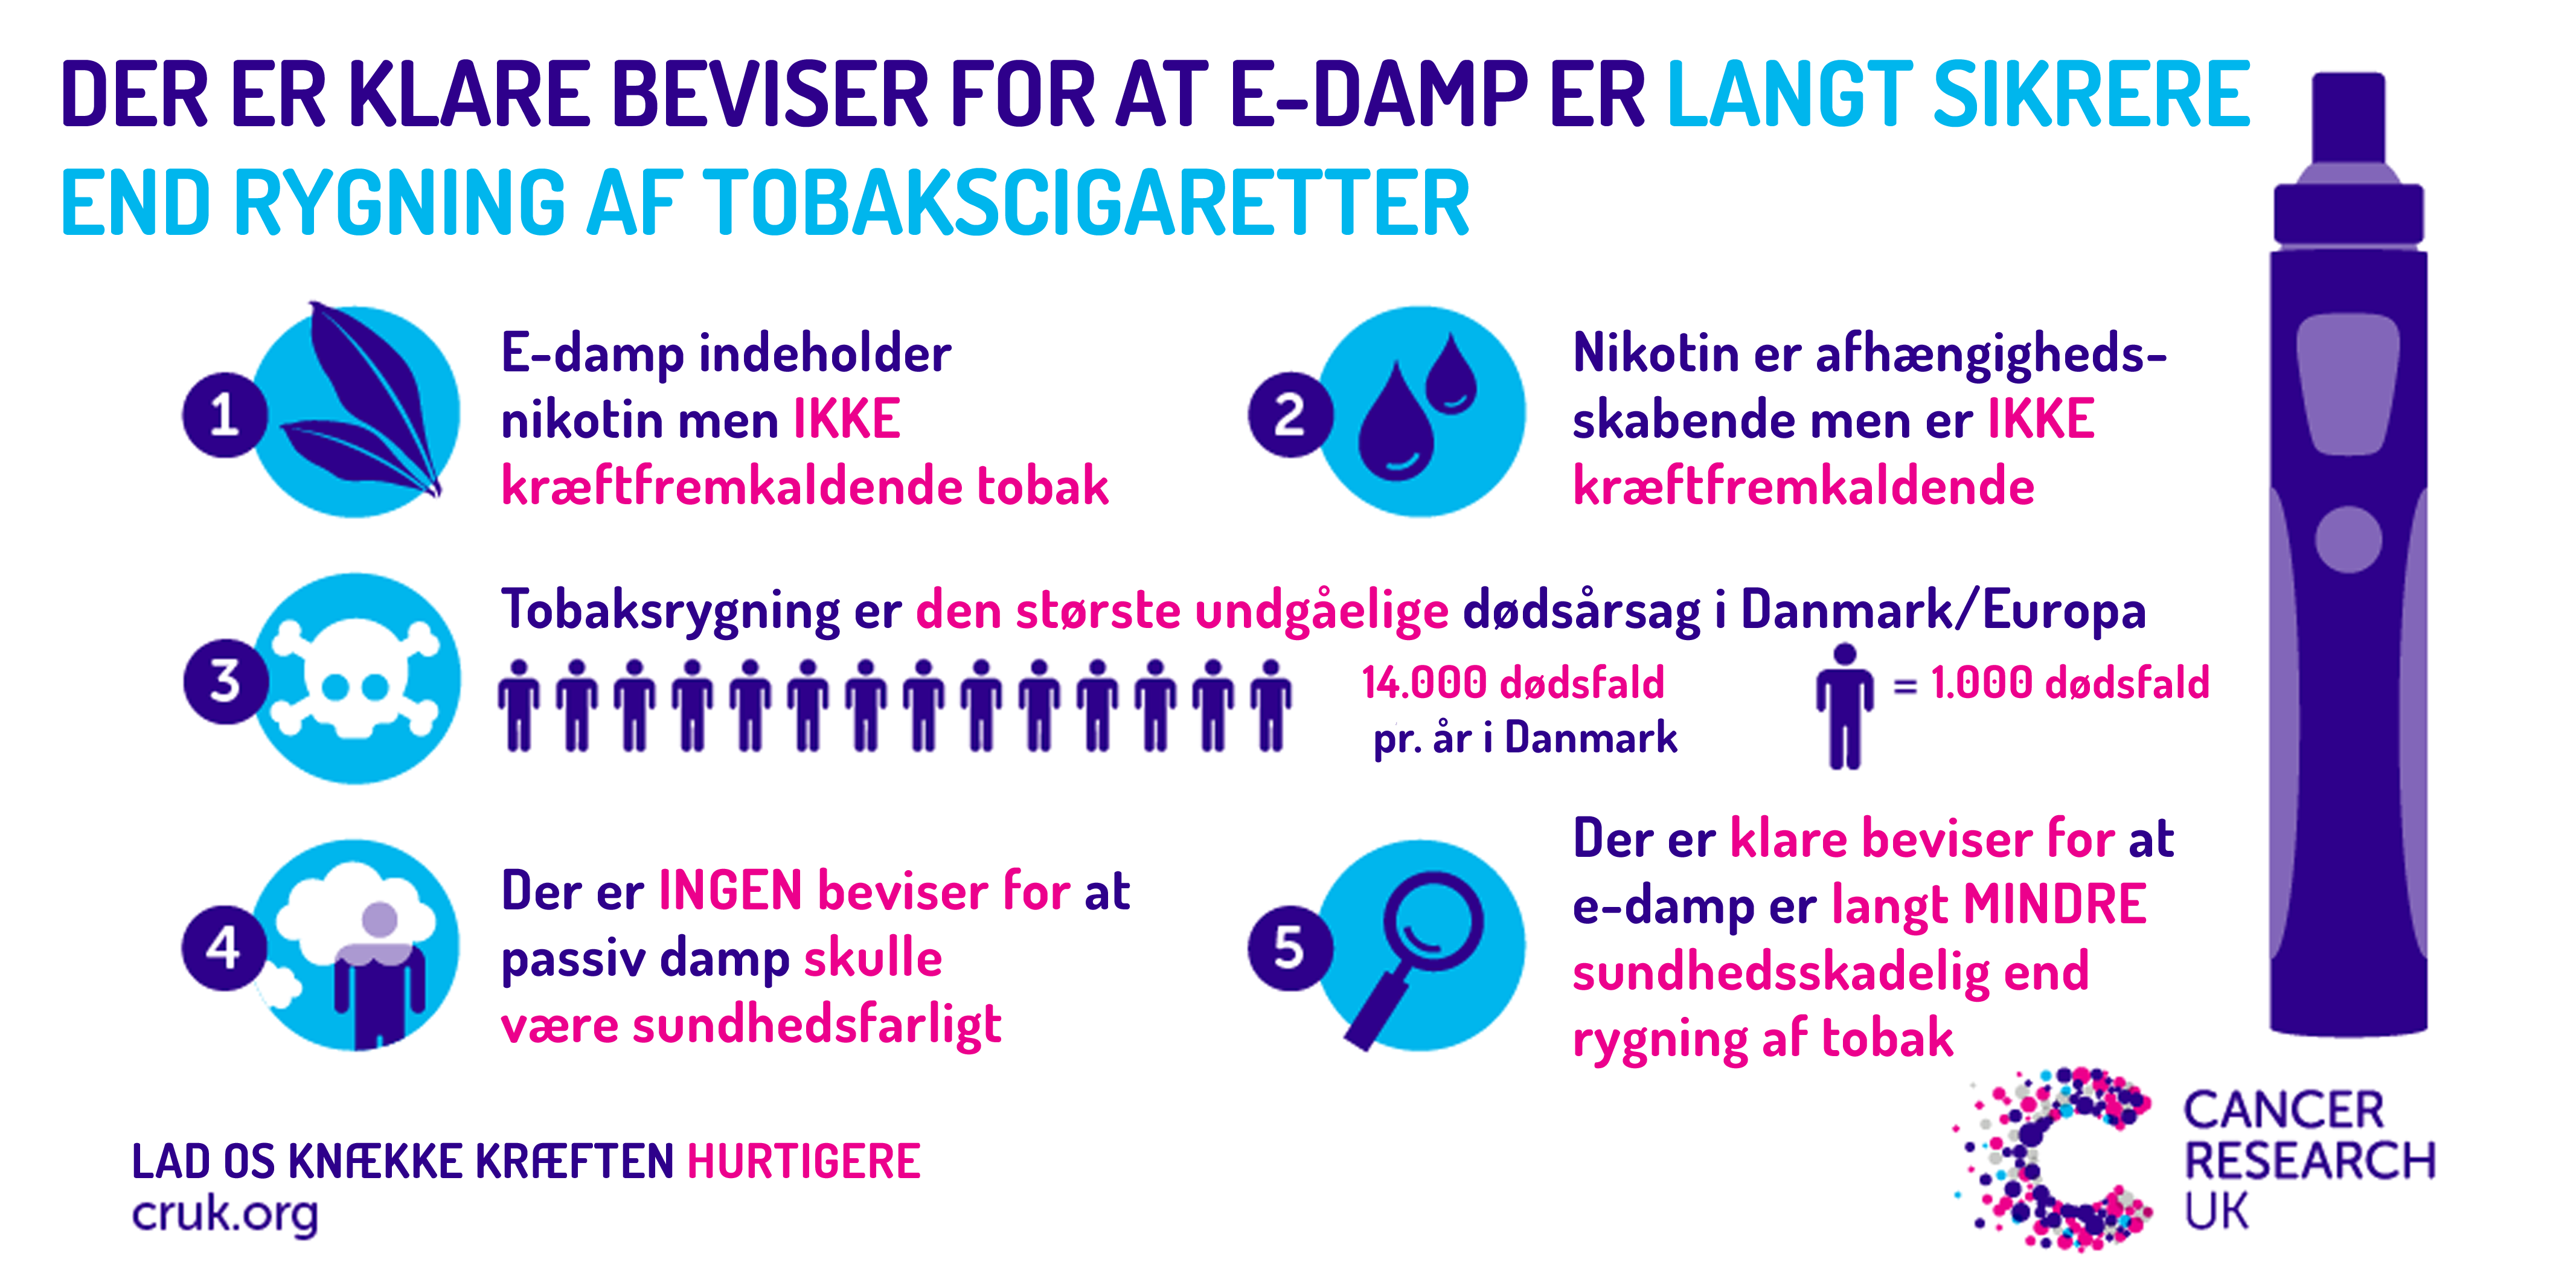 damp rygning